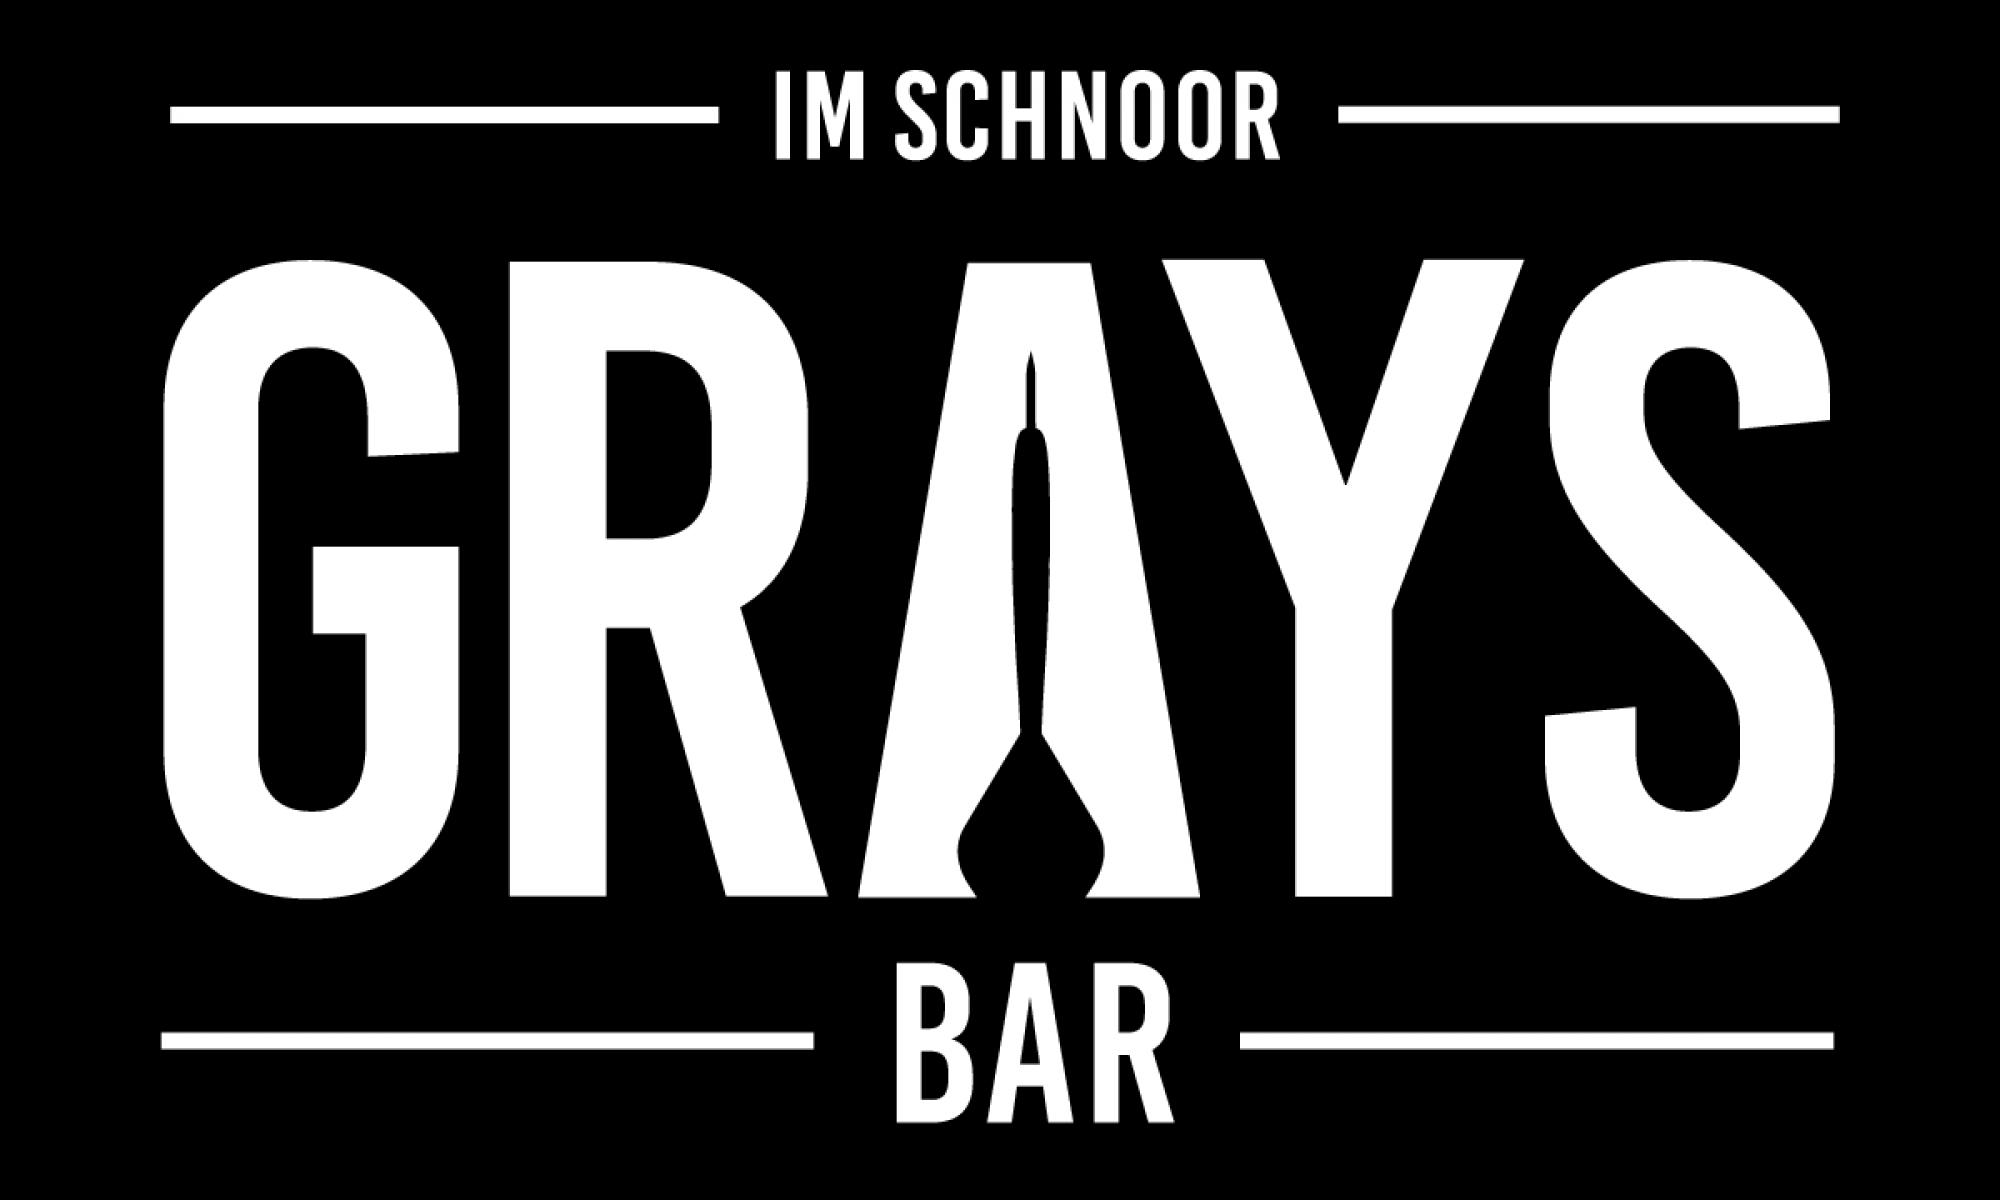 Grays bar